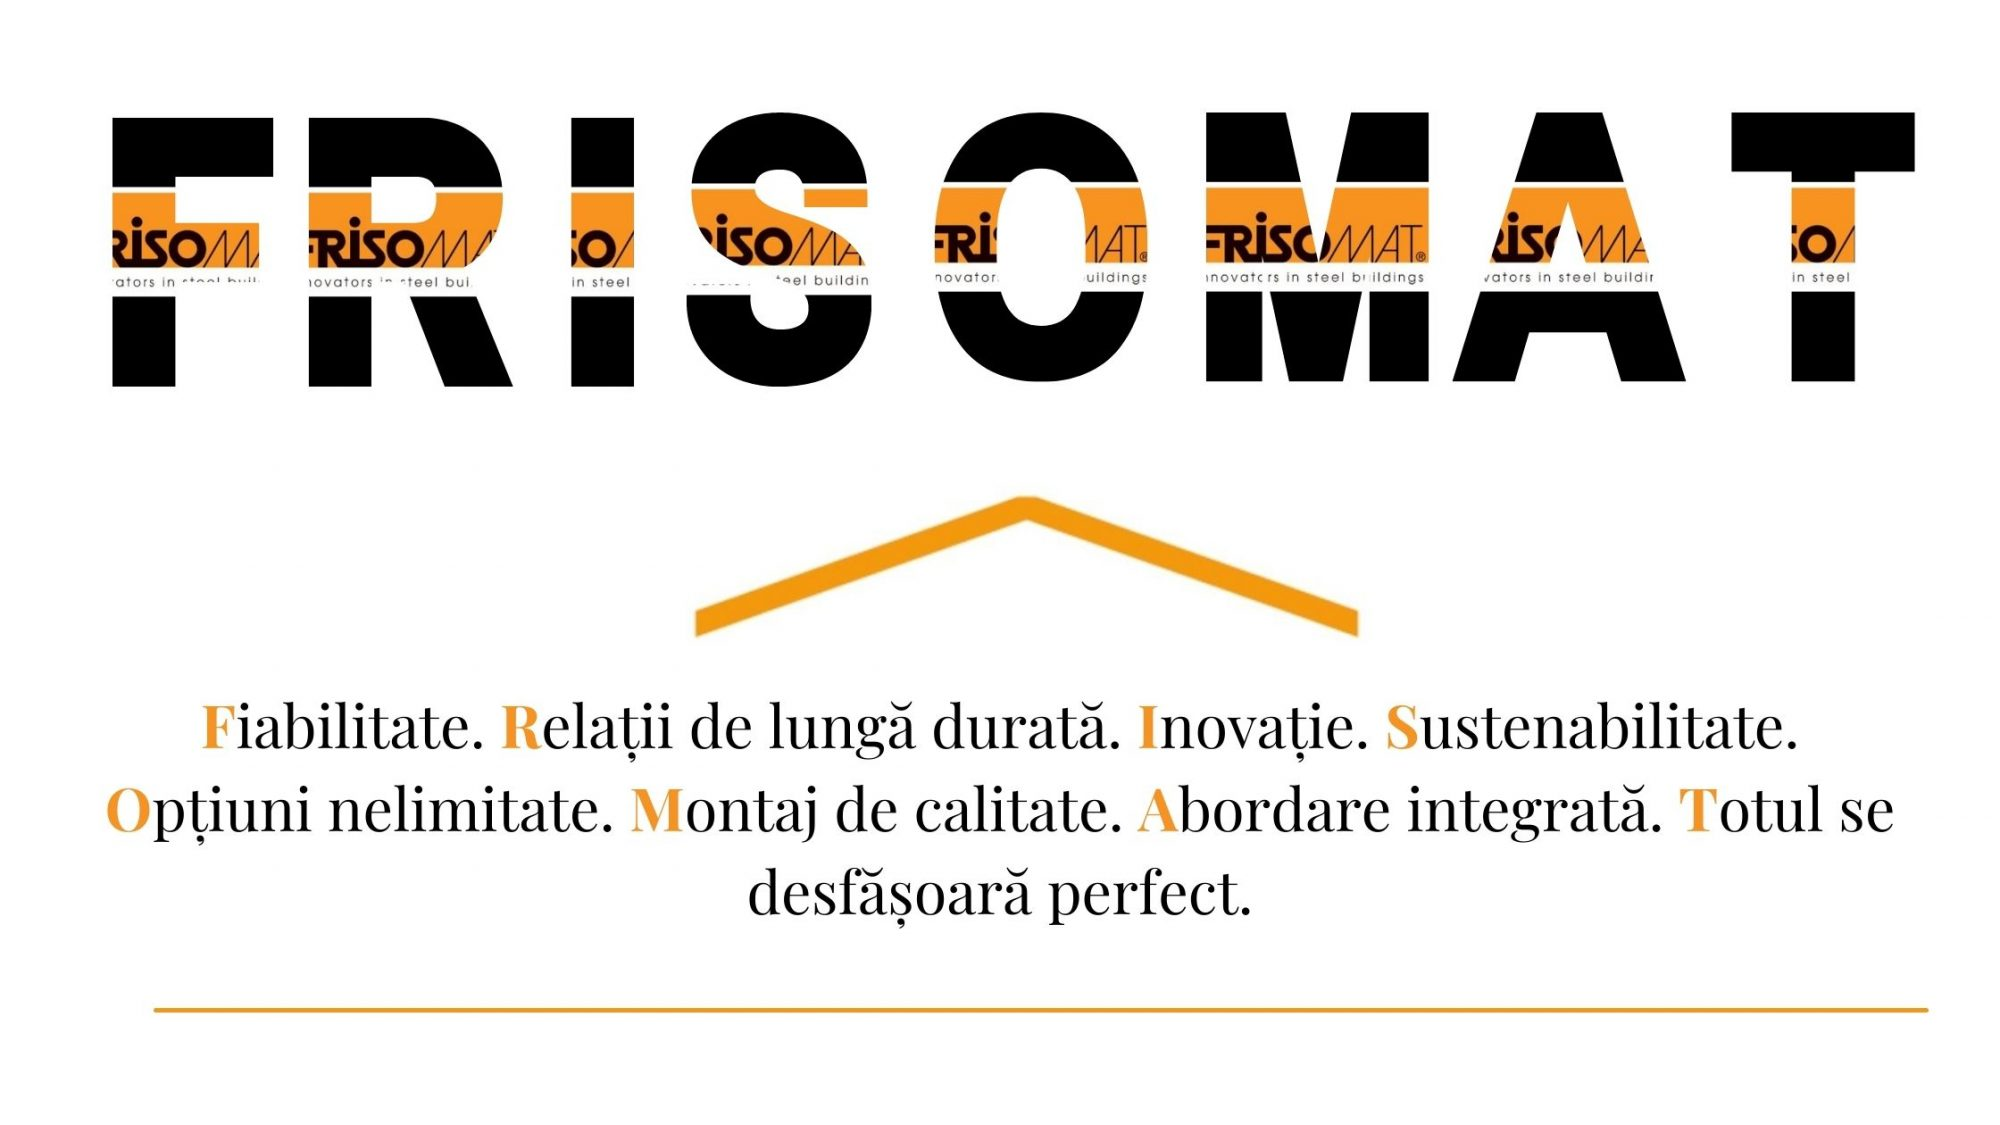 Frisomat Romania